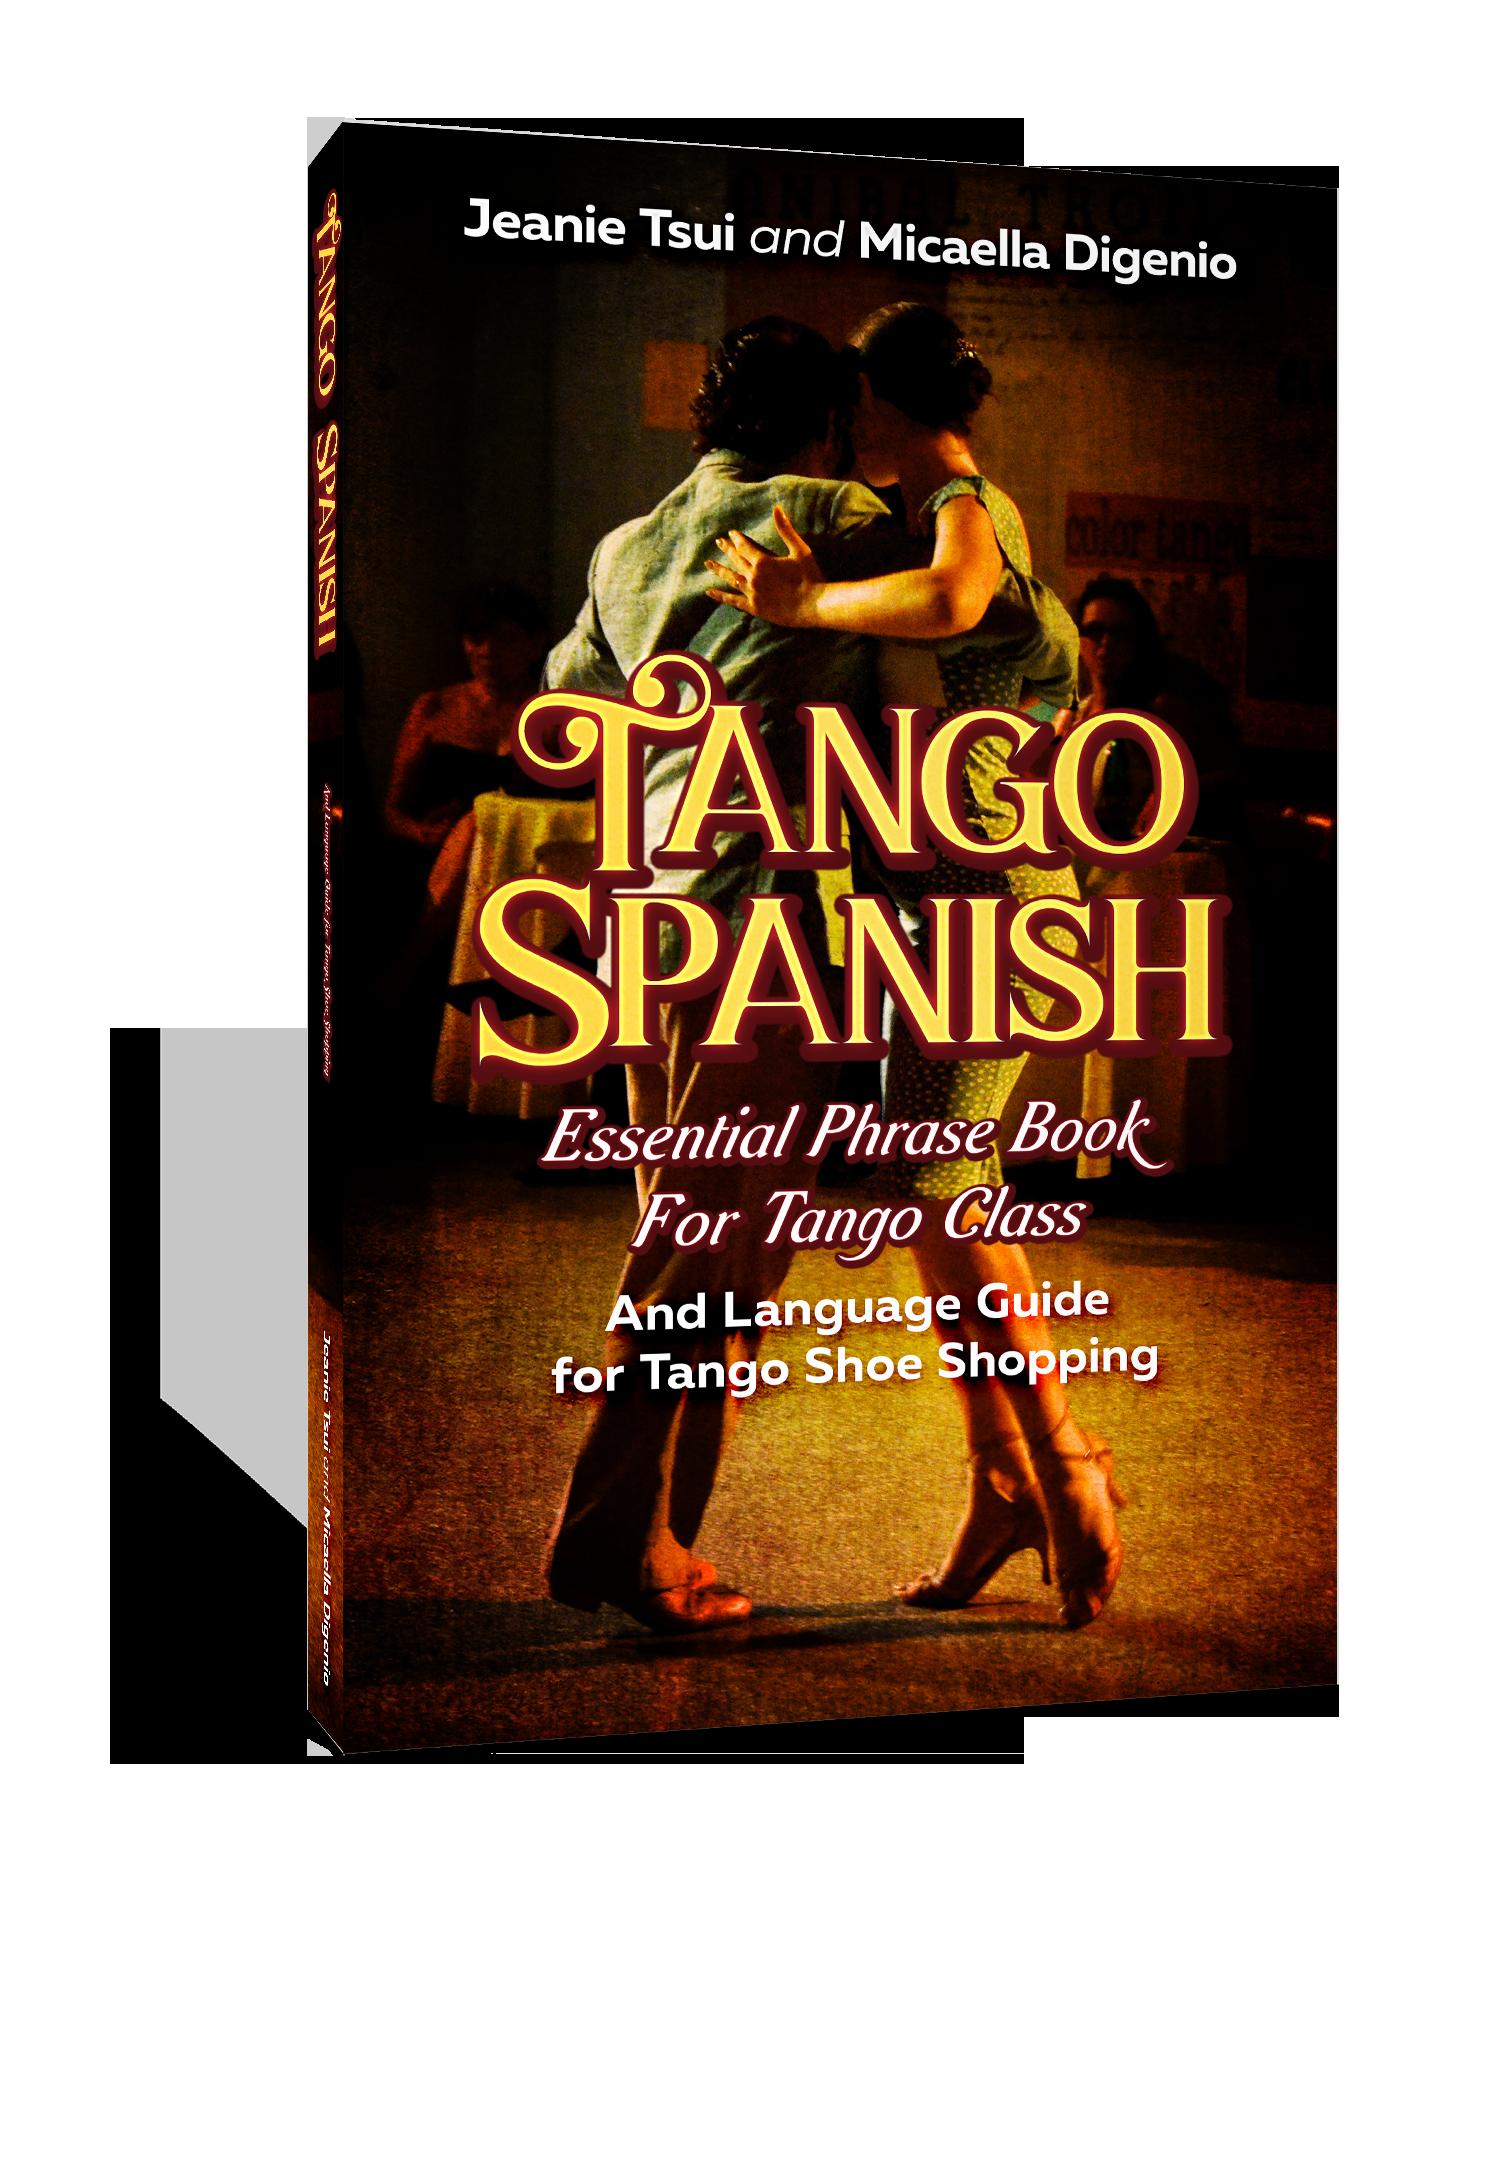 Tango Spanish Essential Phrase Book for Tango Class